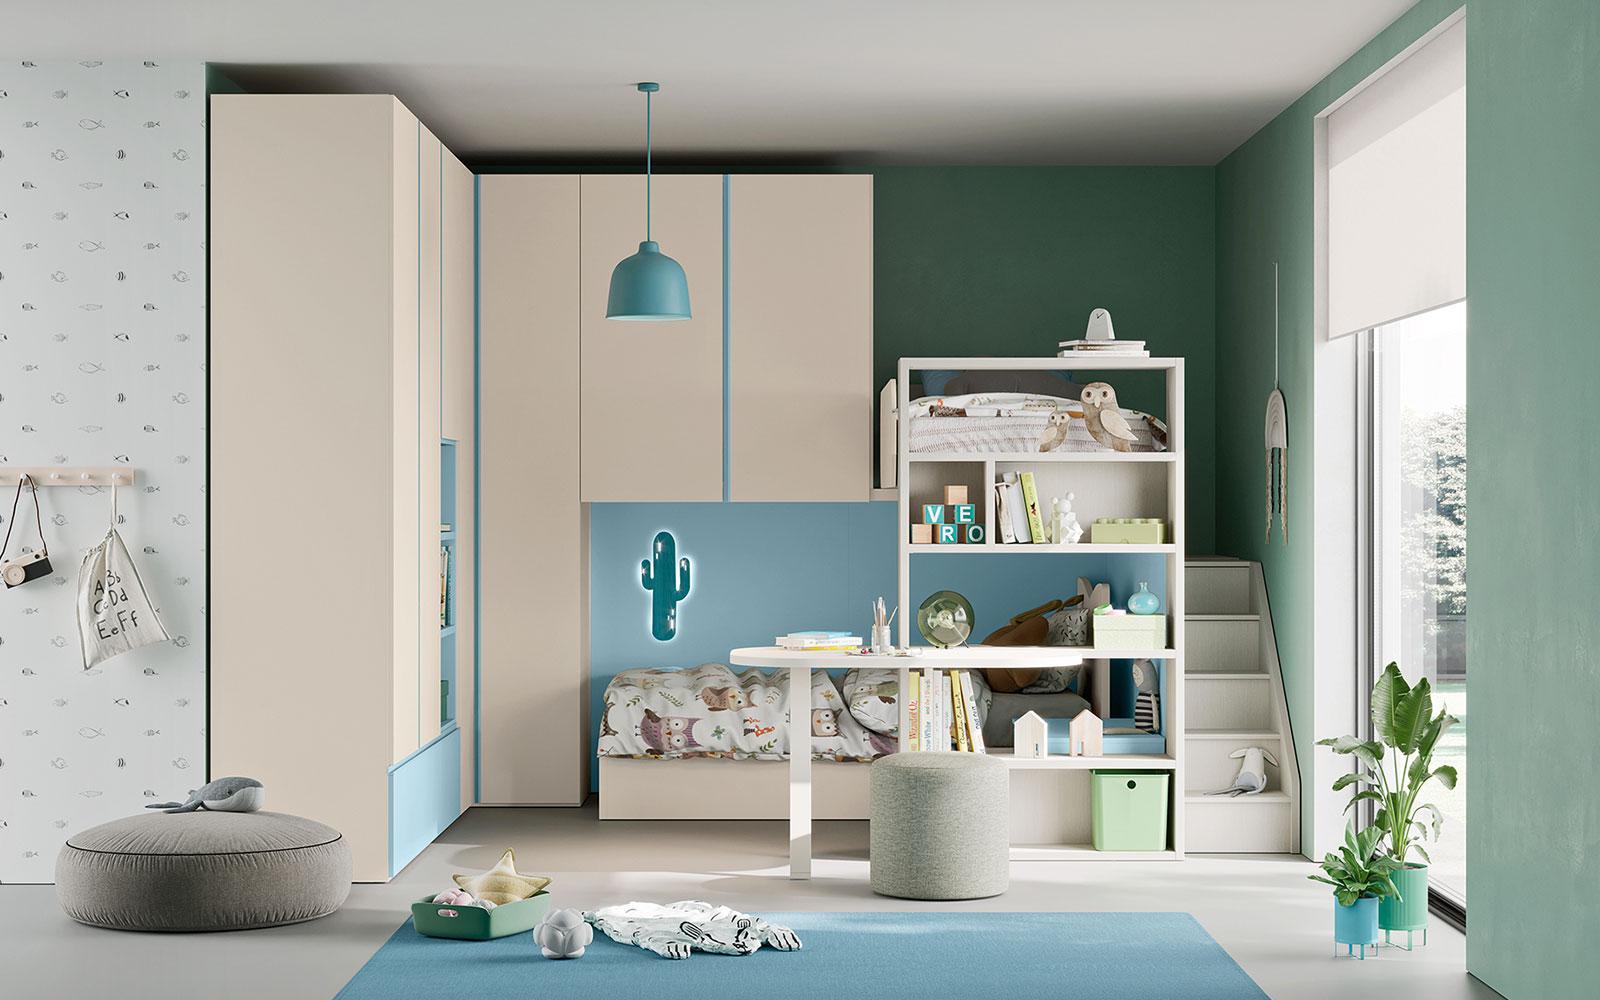 camerette-mobili-ricci01